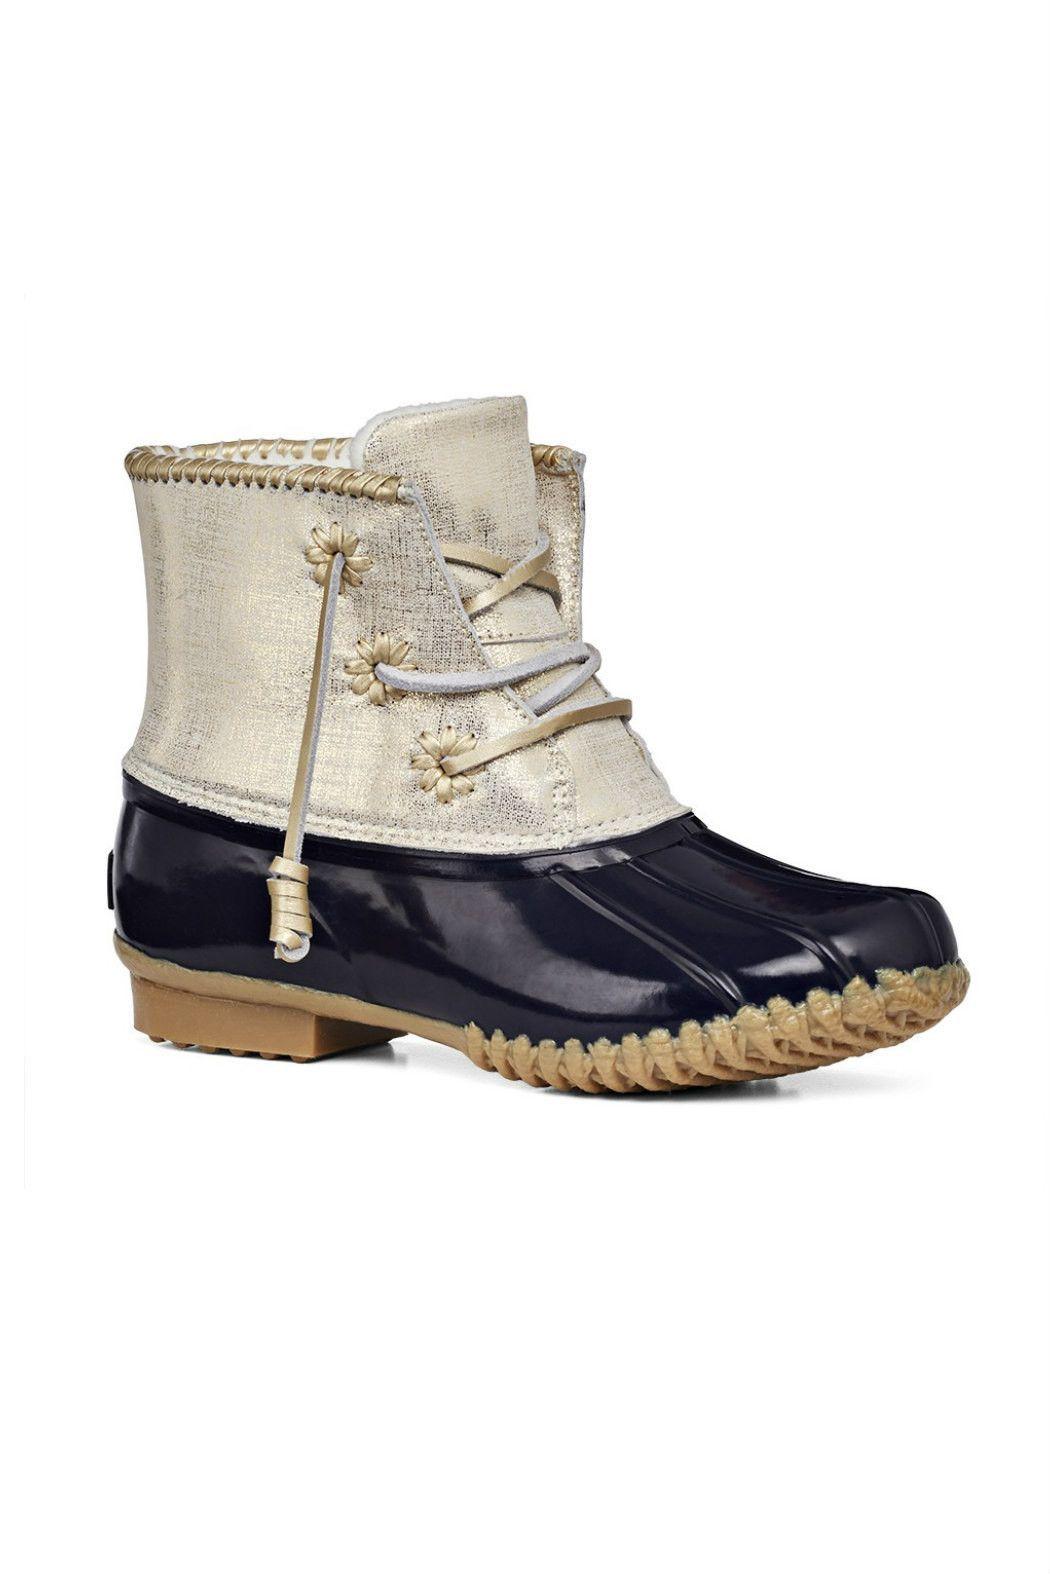 22d5605a380 Jack Rogers Chloe Duck Boot Midnight